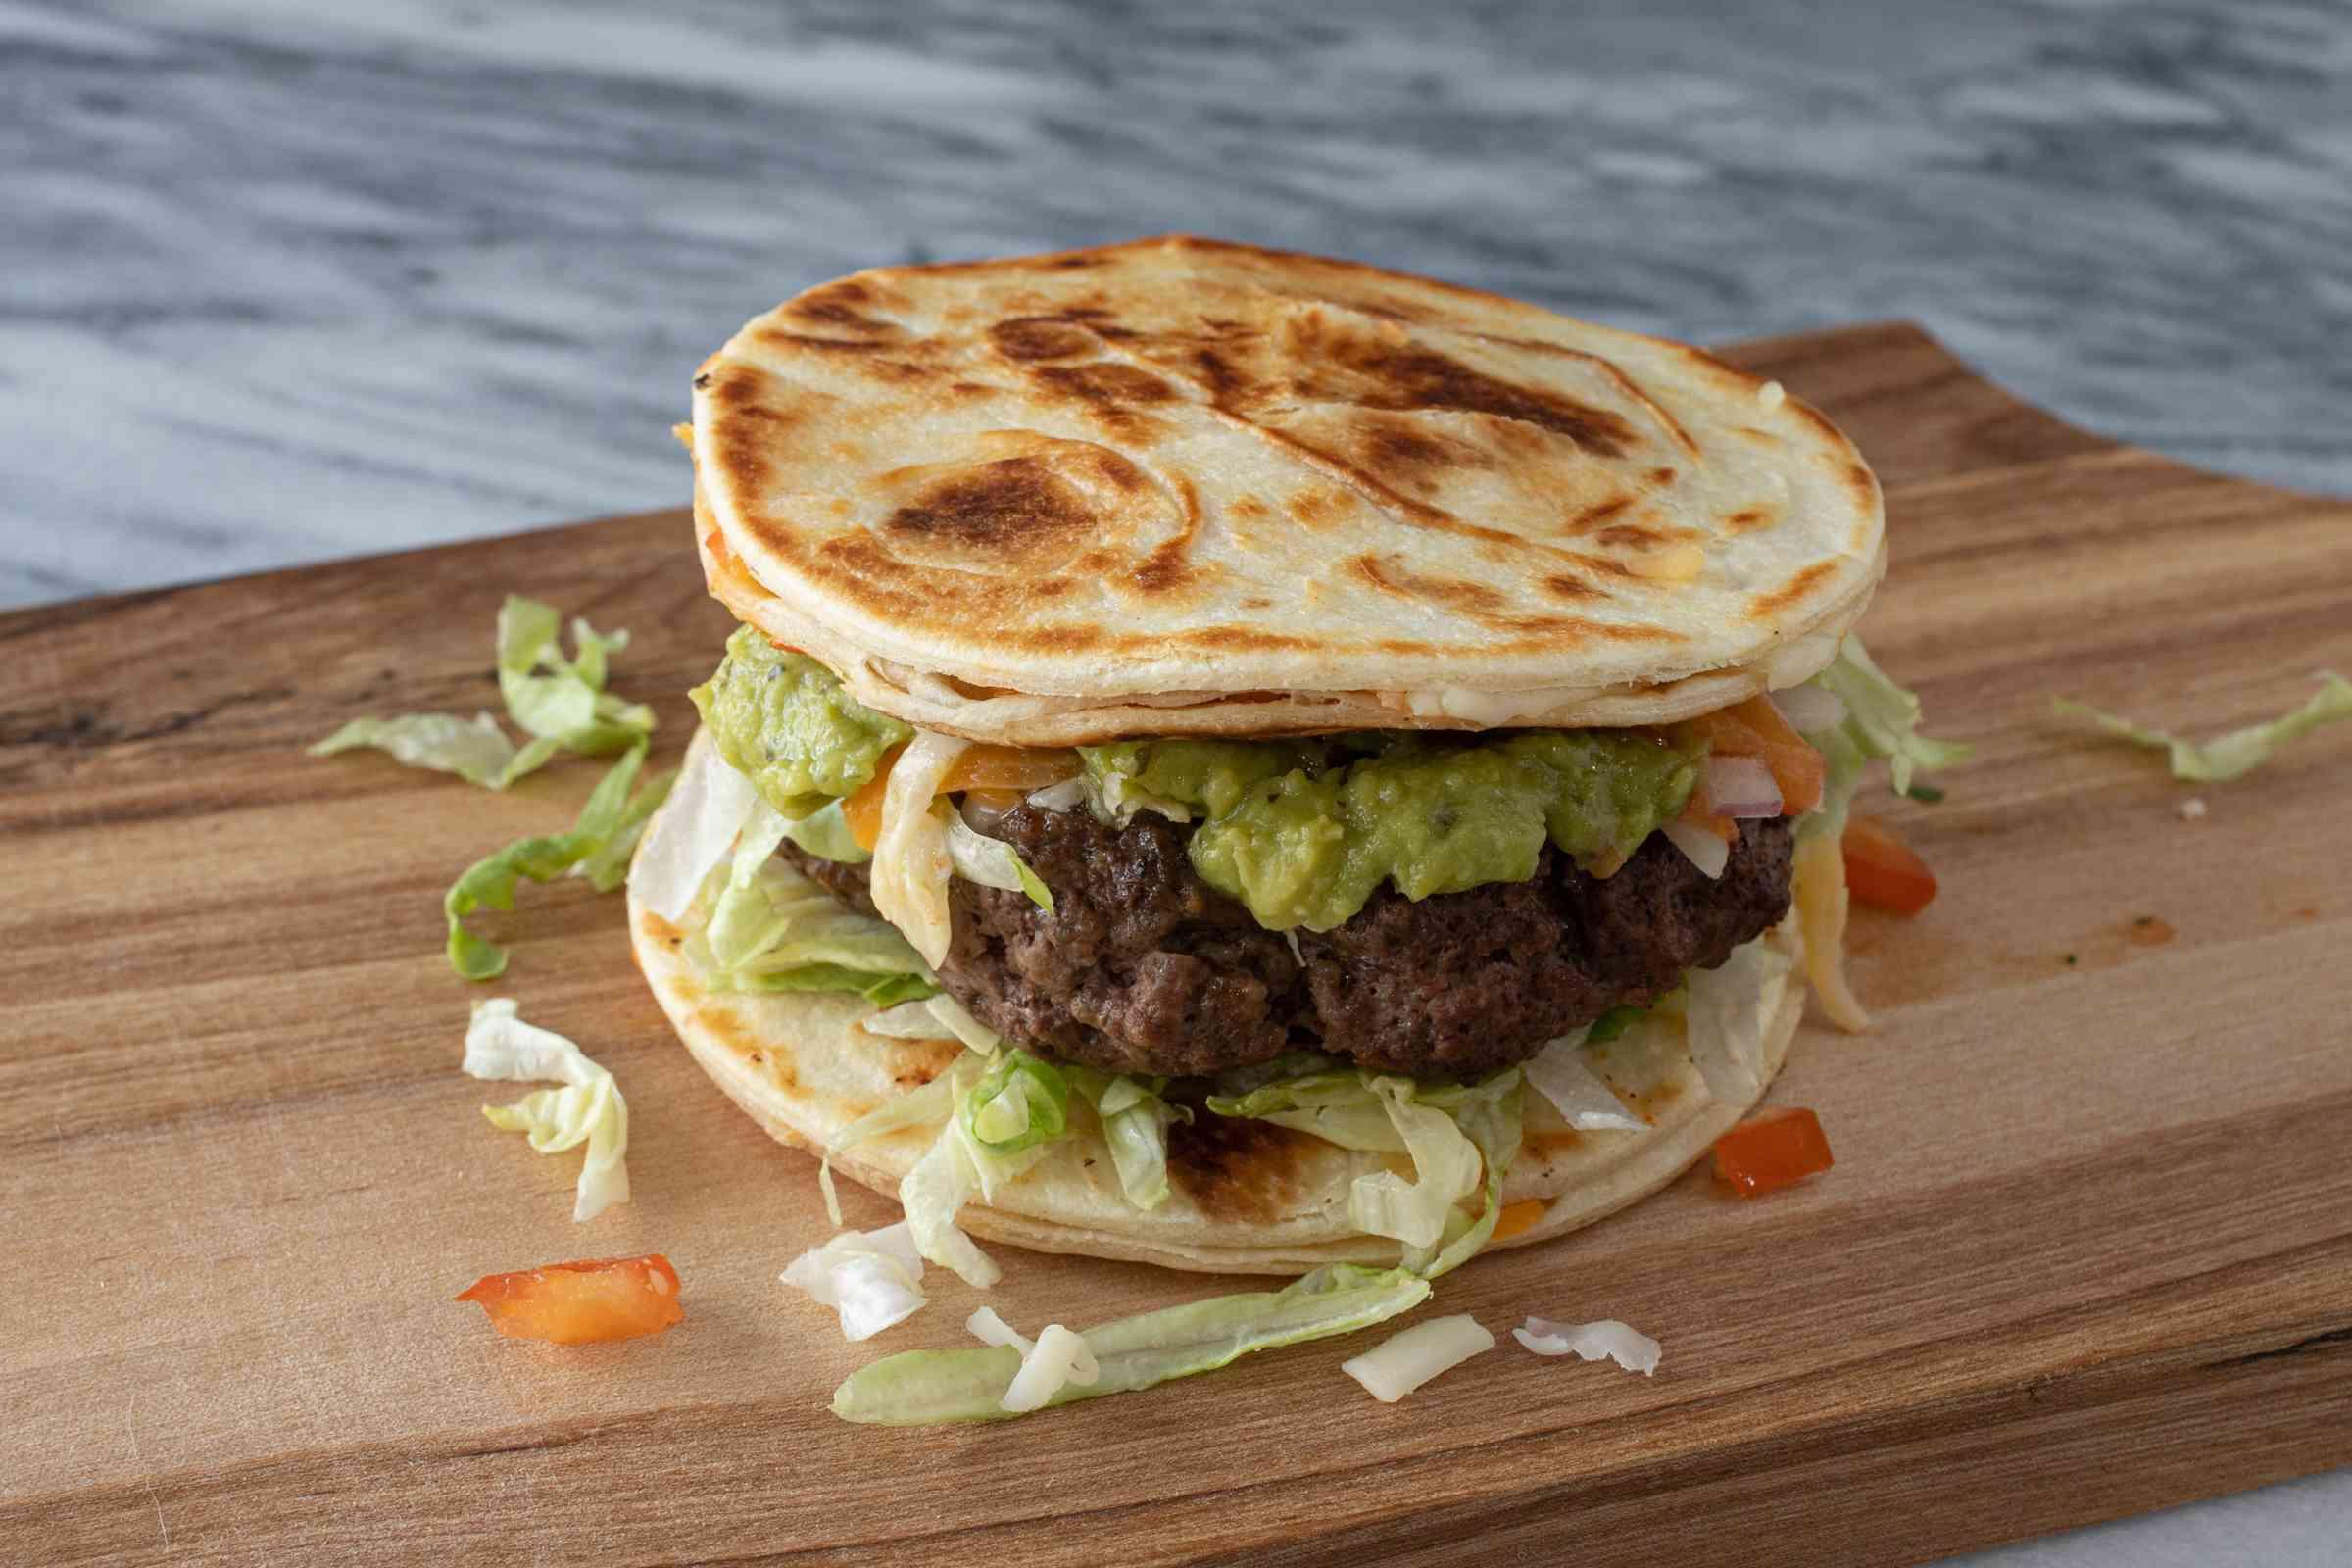 Quesadilla burger assembled on cutting board.